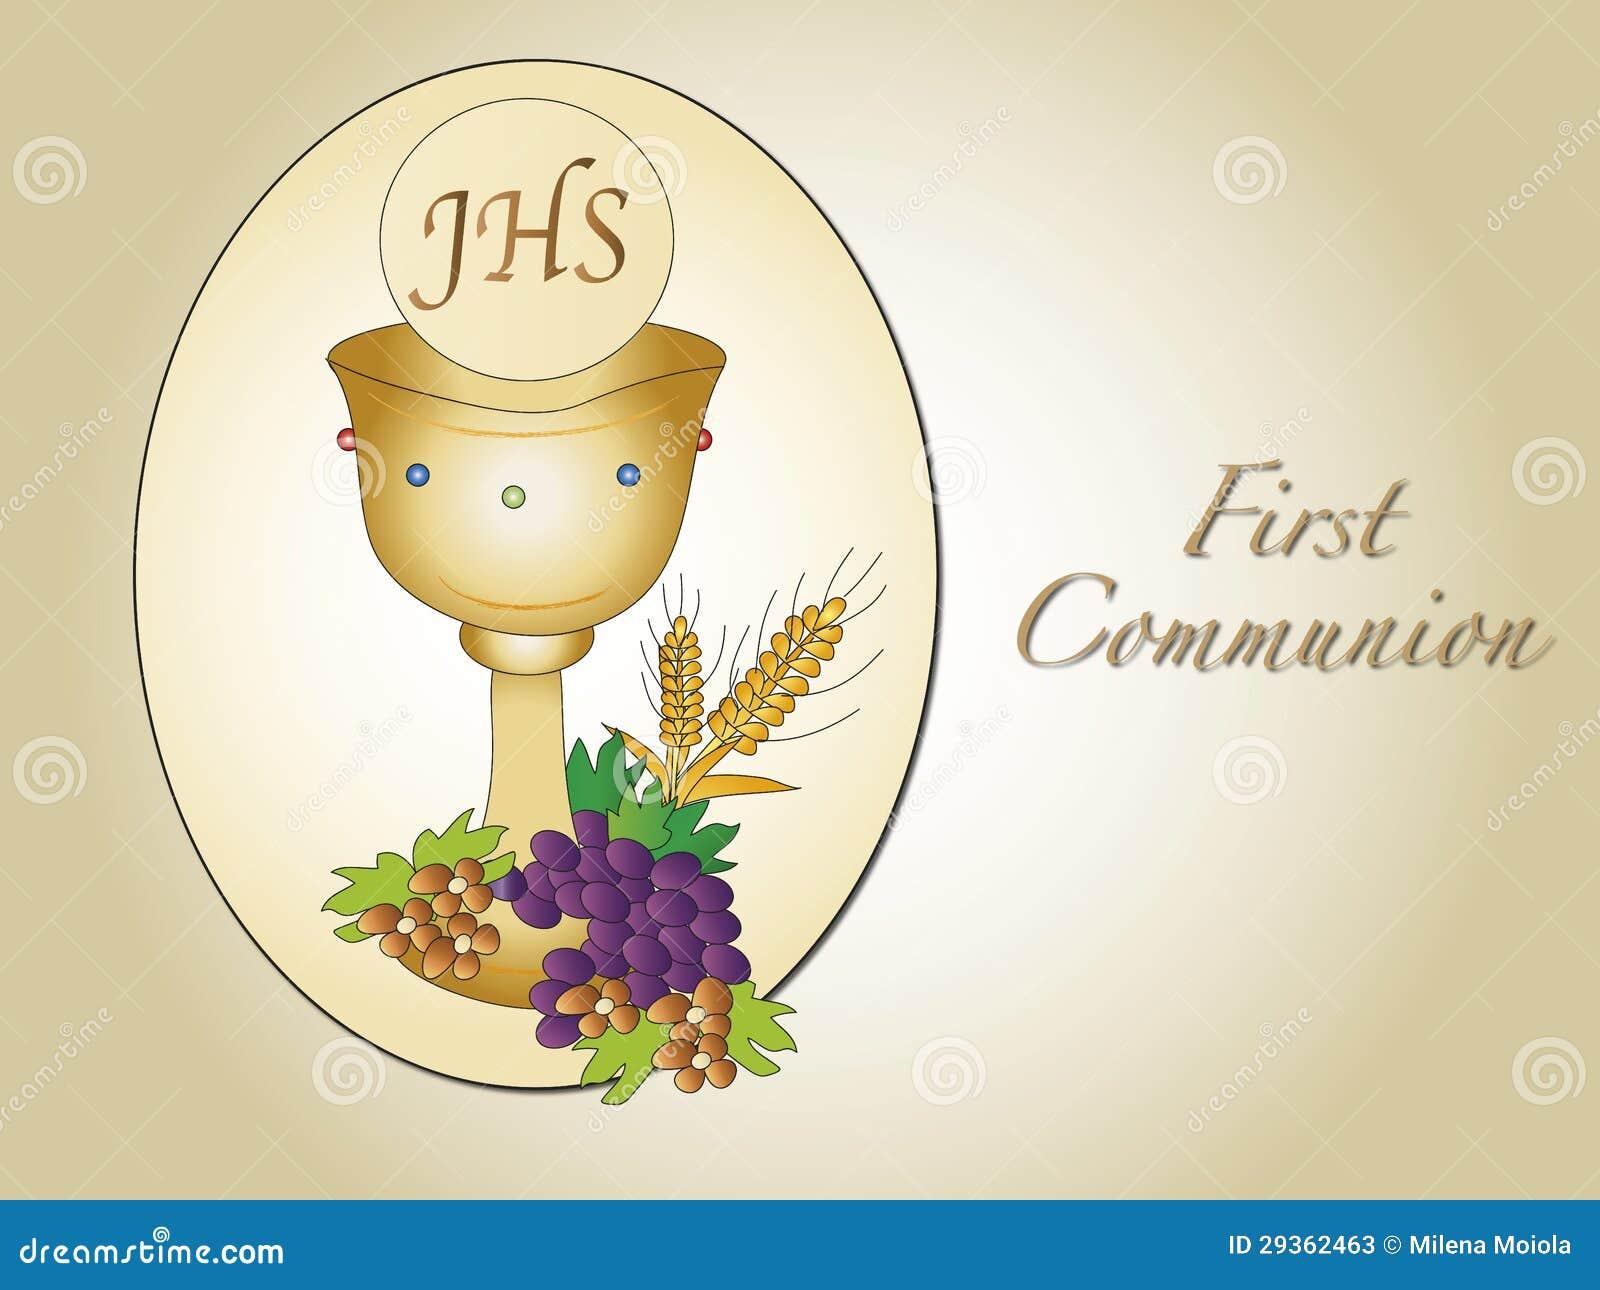 First communion stock illustration. Illustration of image ...